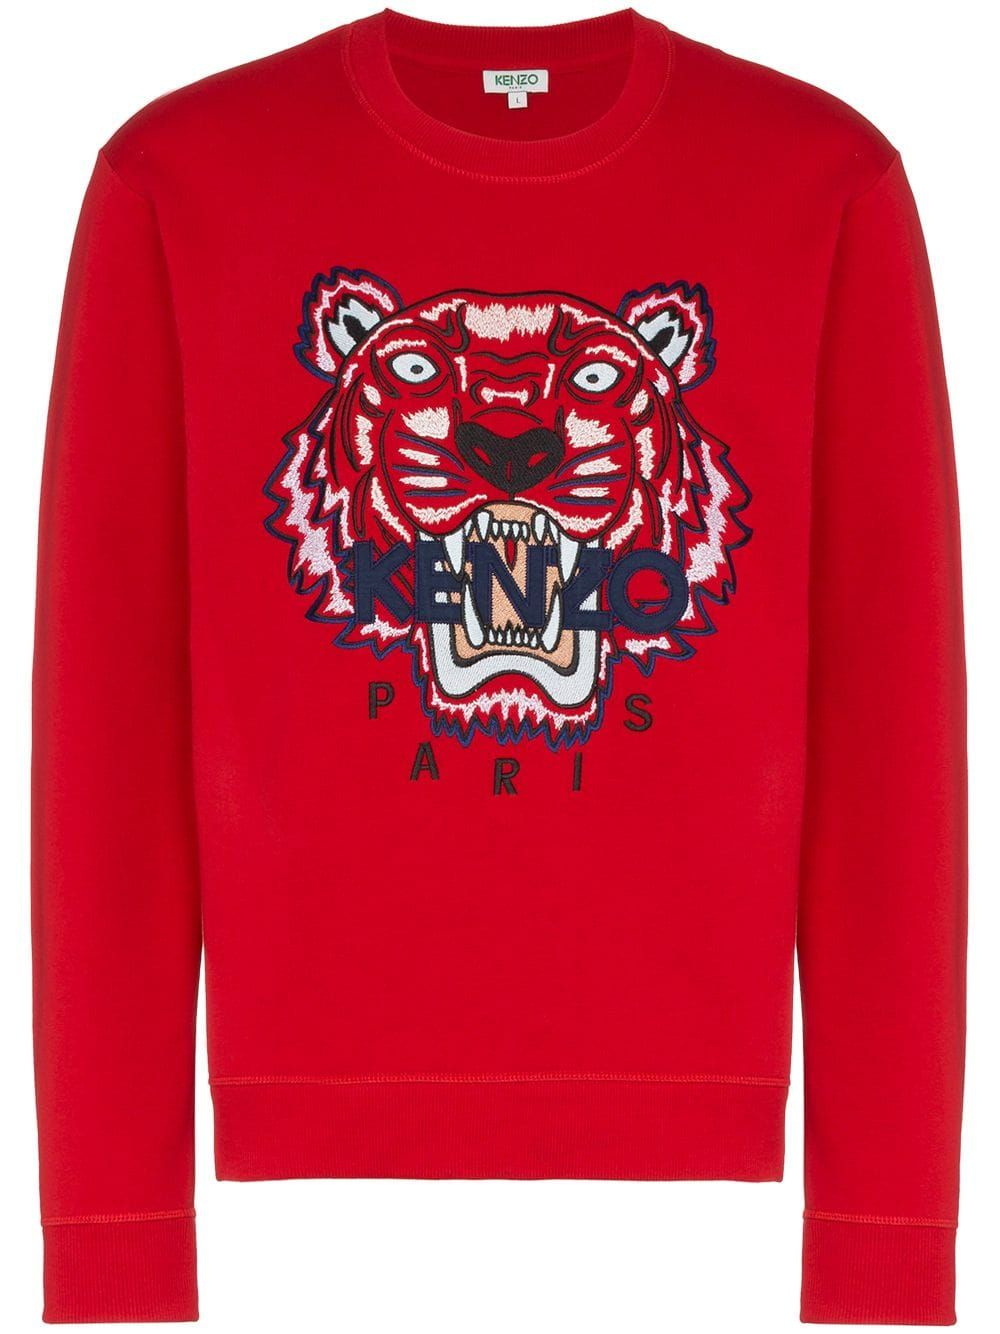 Kenzo red tiger embroidered cotton sweatshirt | Cotton